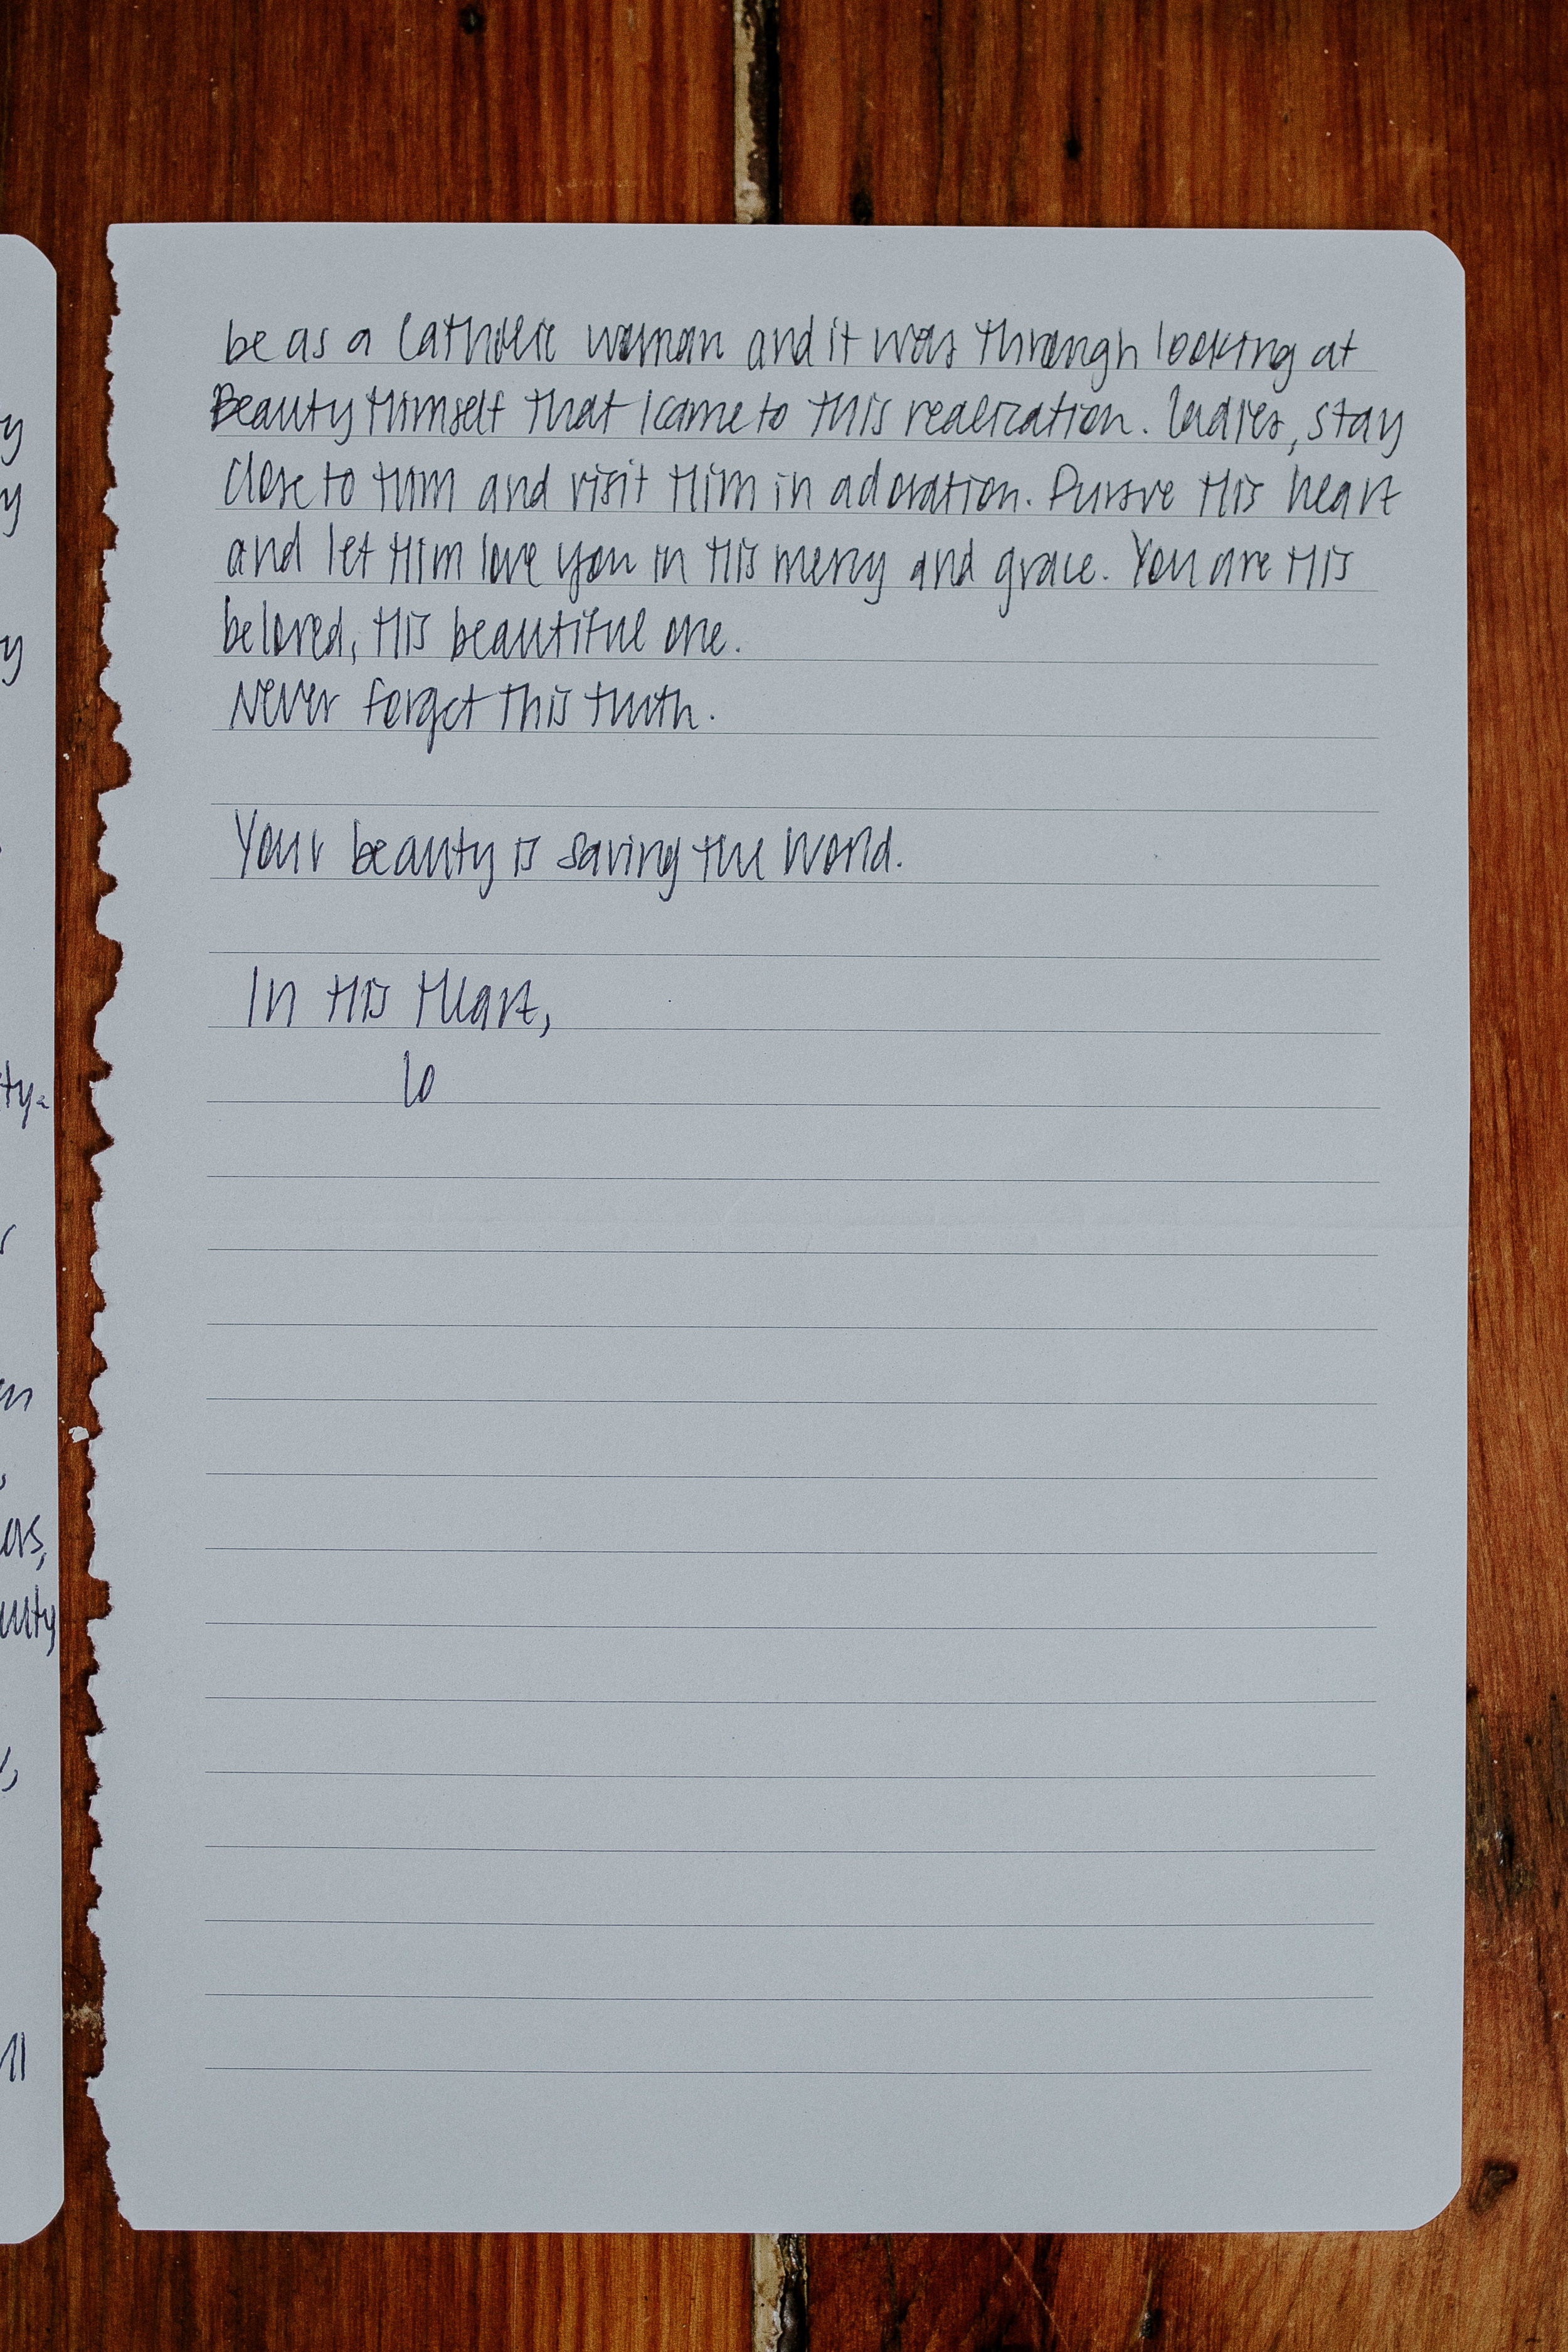 Lo schubilske Letter to Women The Catholic Woman